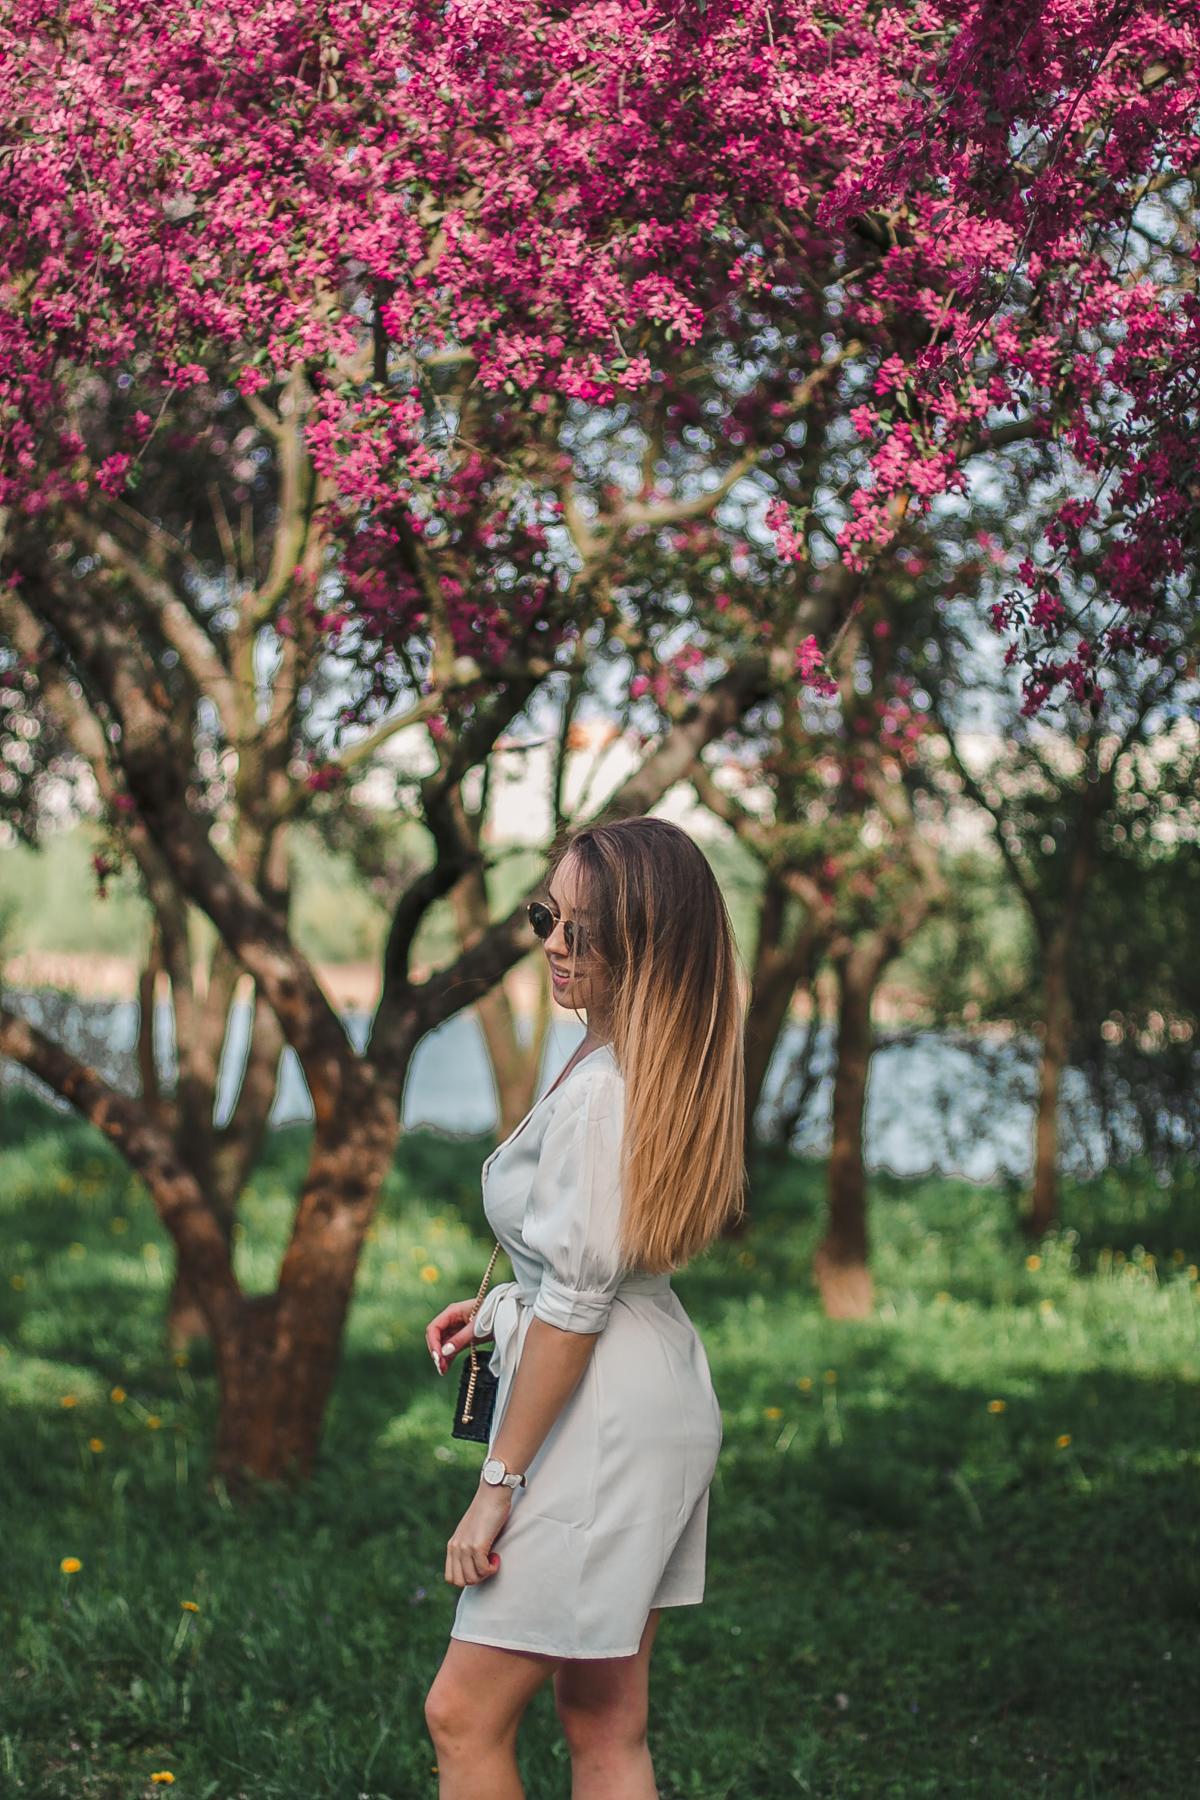 beżowa sukienka wiosenna na-kd